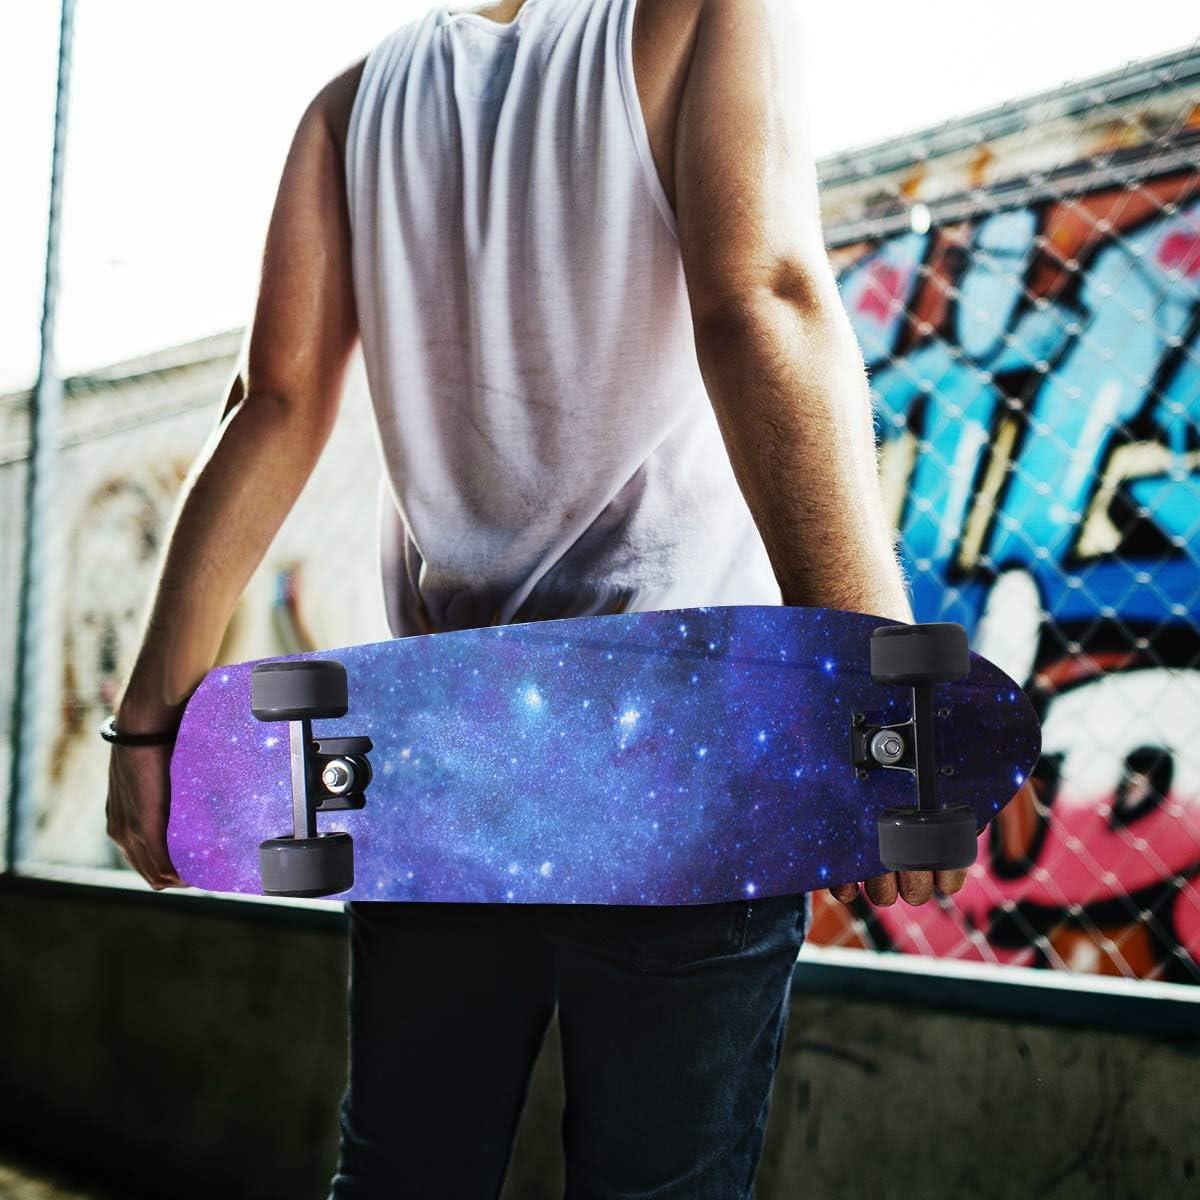 84cm x 23cm Anti Slip Bubble Free Waterproof Grip Tape Sheet Sandpaper for Skateboard UHOO Skateboard Griptape,Space with Billion Stars Inspiring View Nebula Galaxy Cosmos Infinite 1 pcs 9 x 33